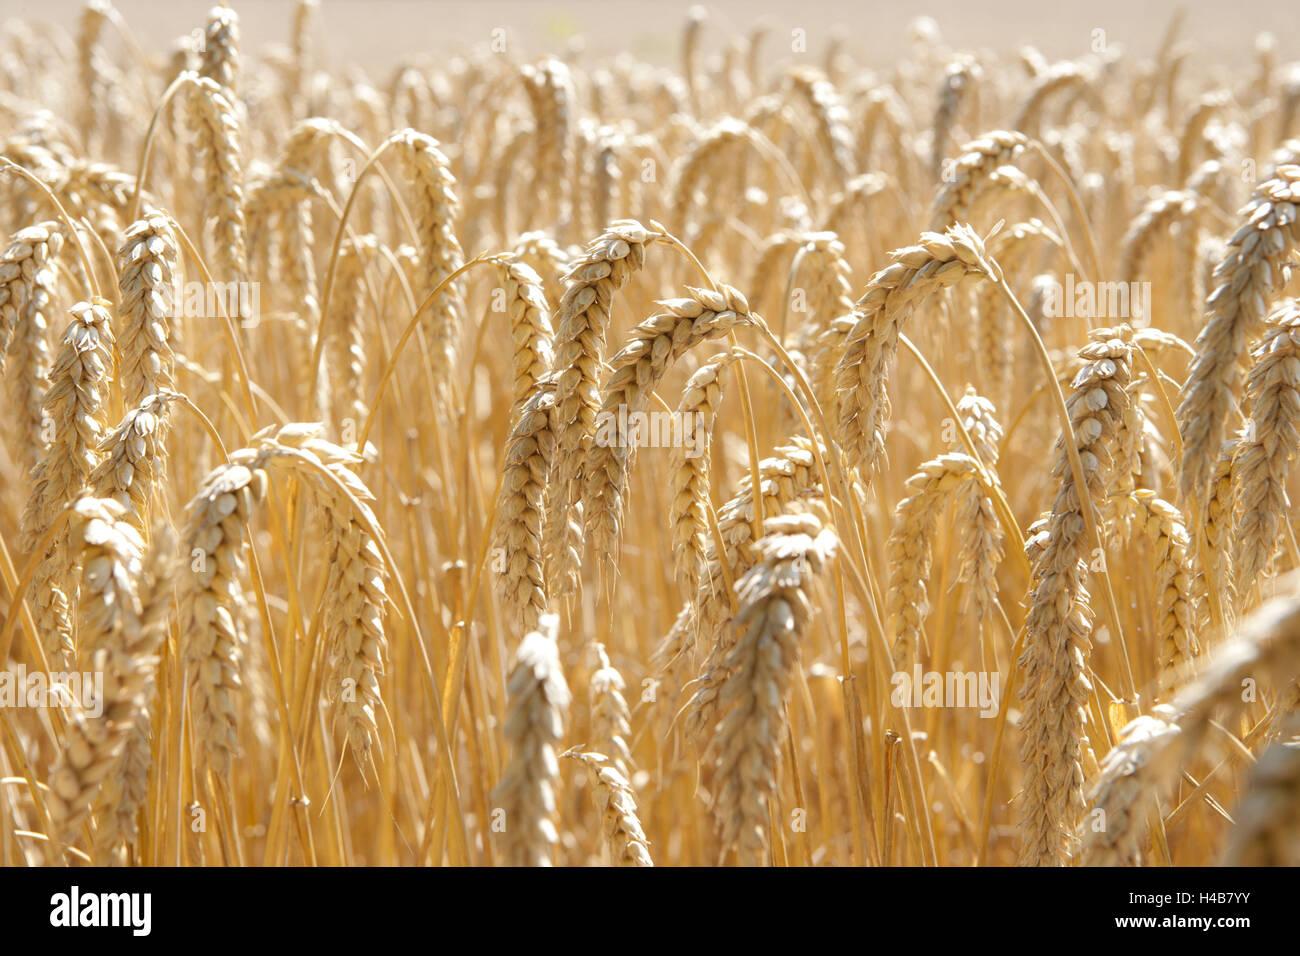 Grain ears, close-up, - Stock Image